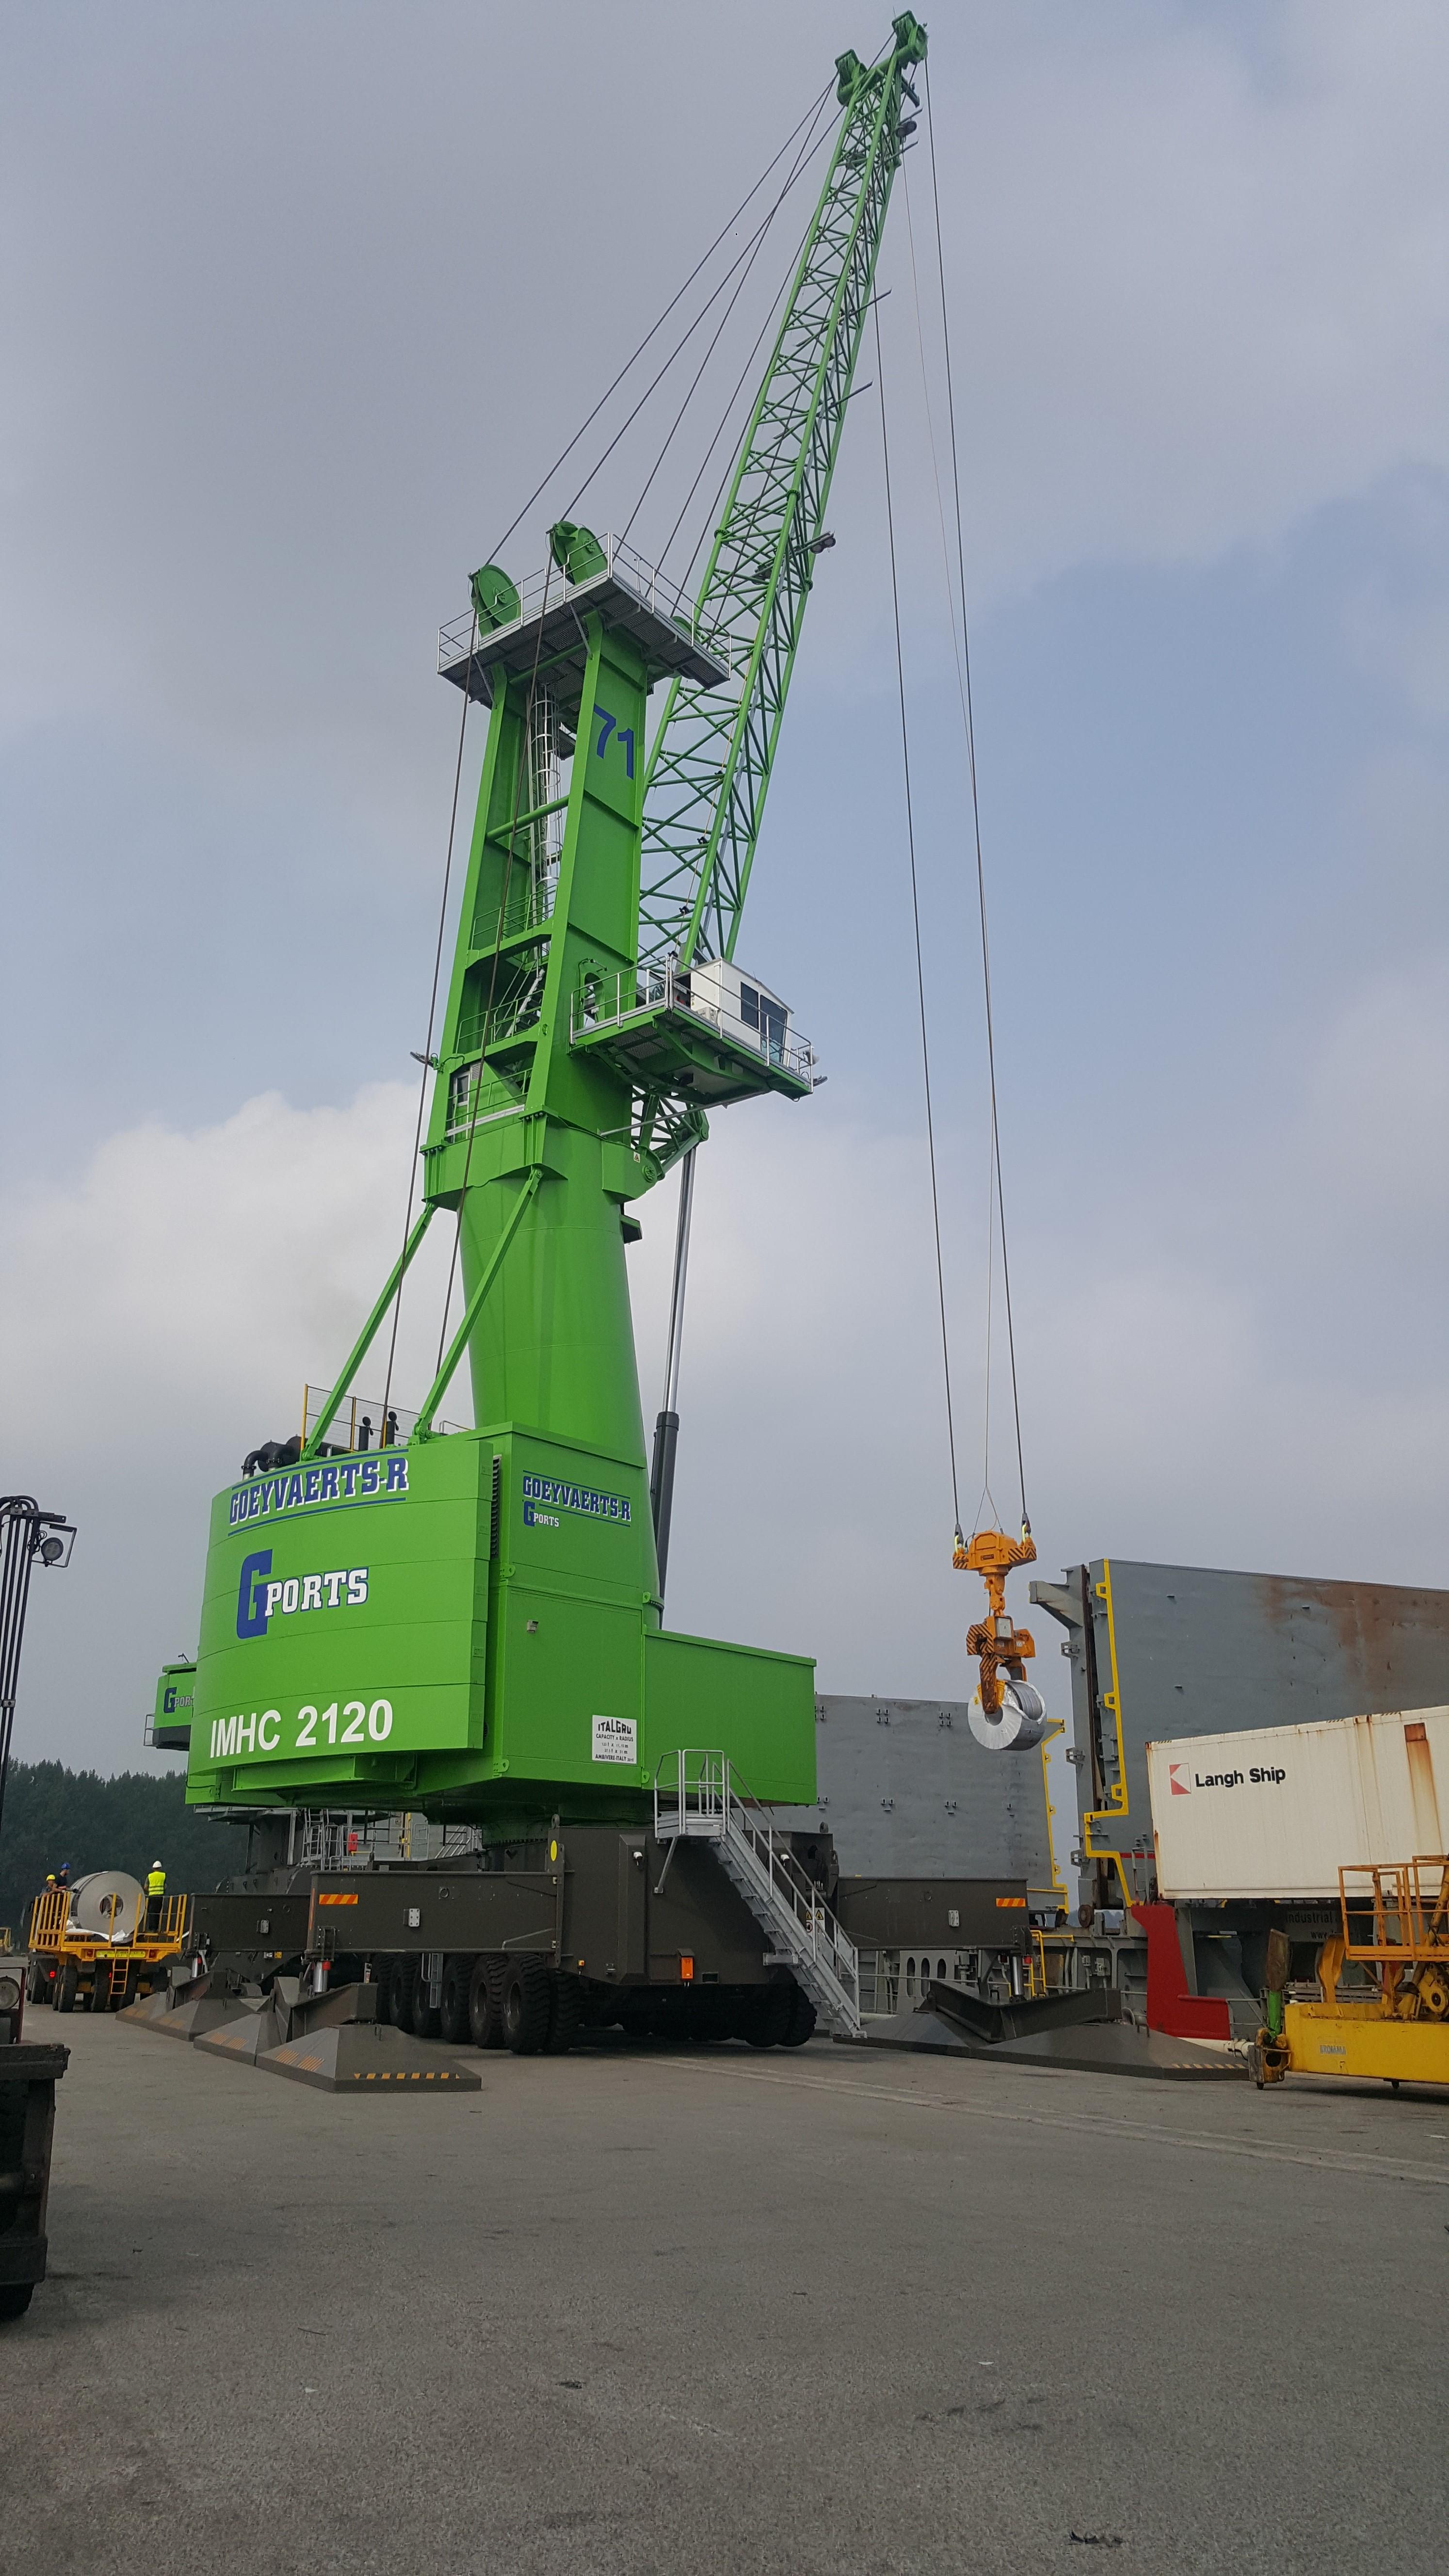 Italgru IMHC 2120 in operation in Terneuzen